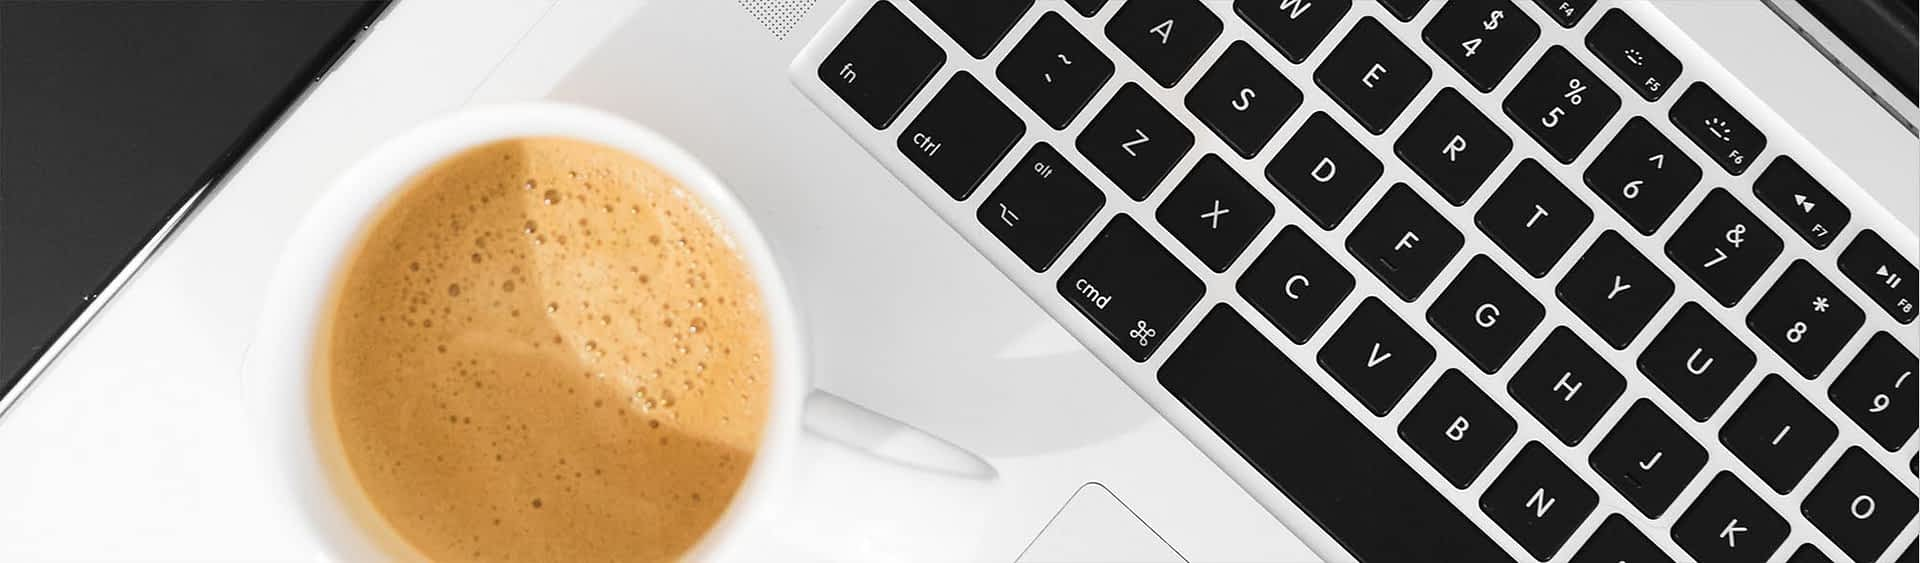 wordpress-underviser-bred-hvid-coffe-keyboard